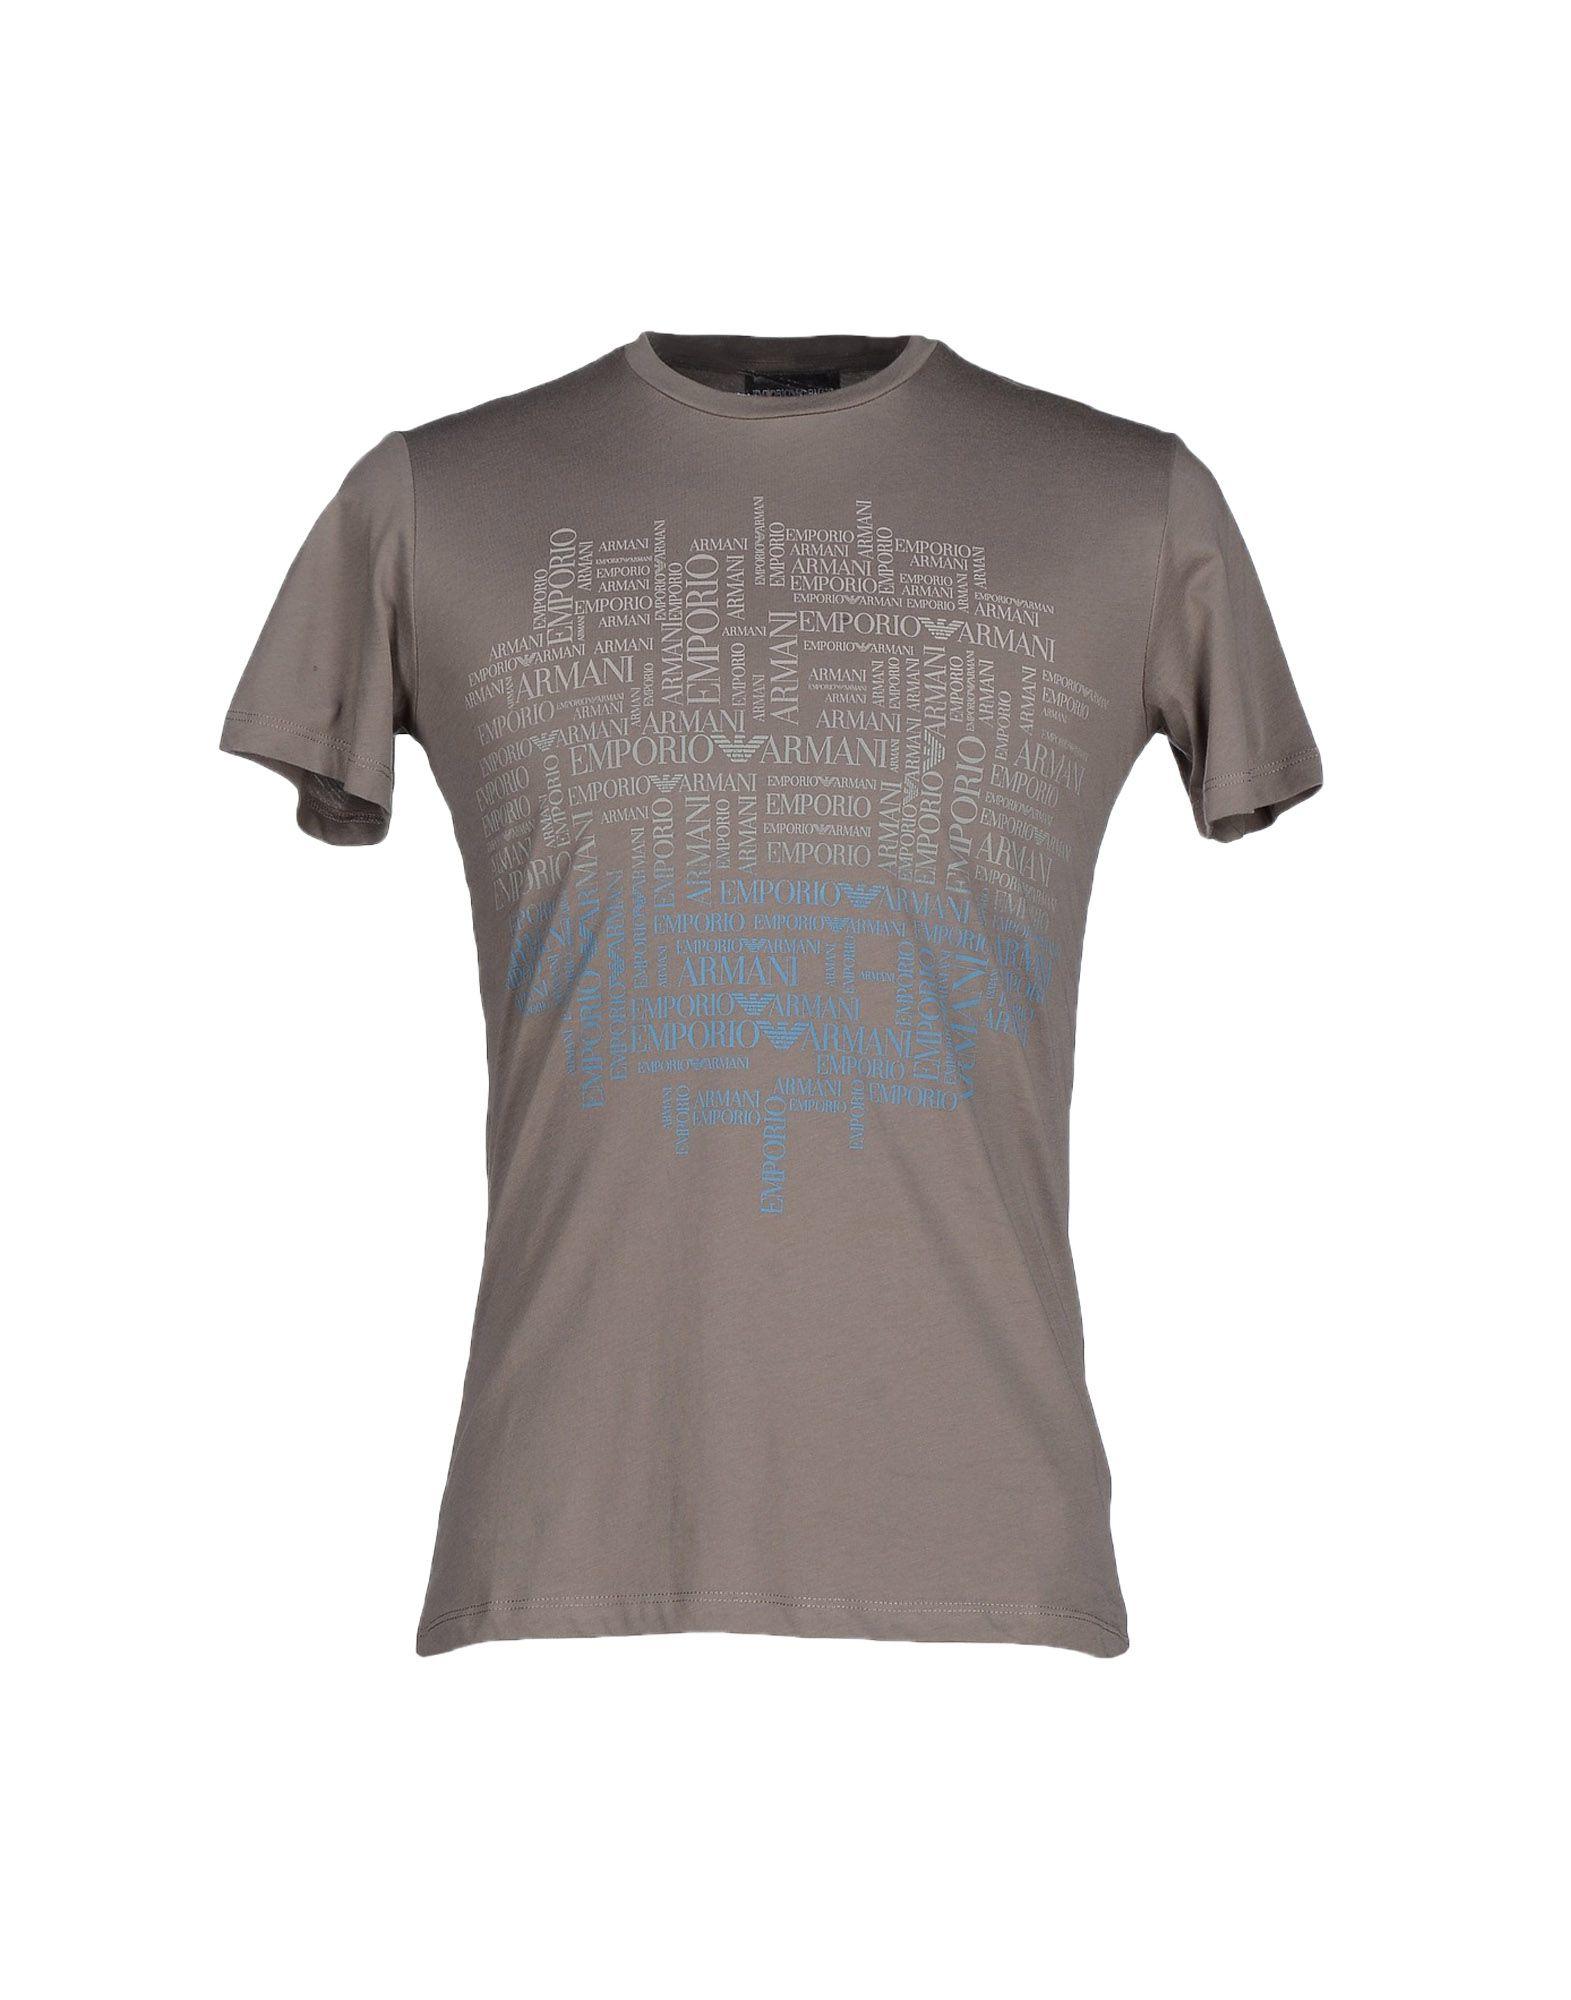 emporio armani t shirt in gray for men lyst. Black Bedroom Furniture Sets. Home Design Ideas